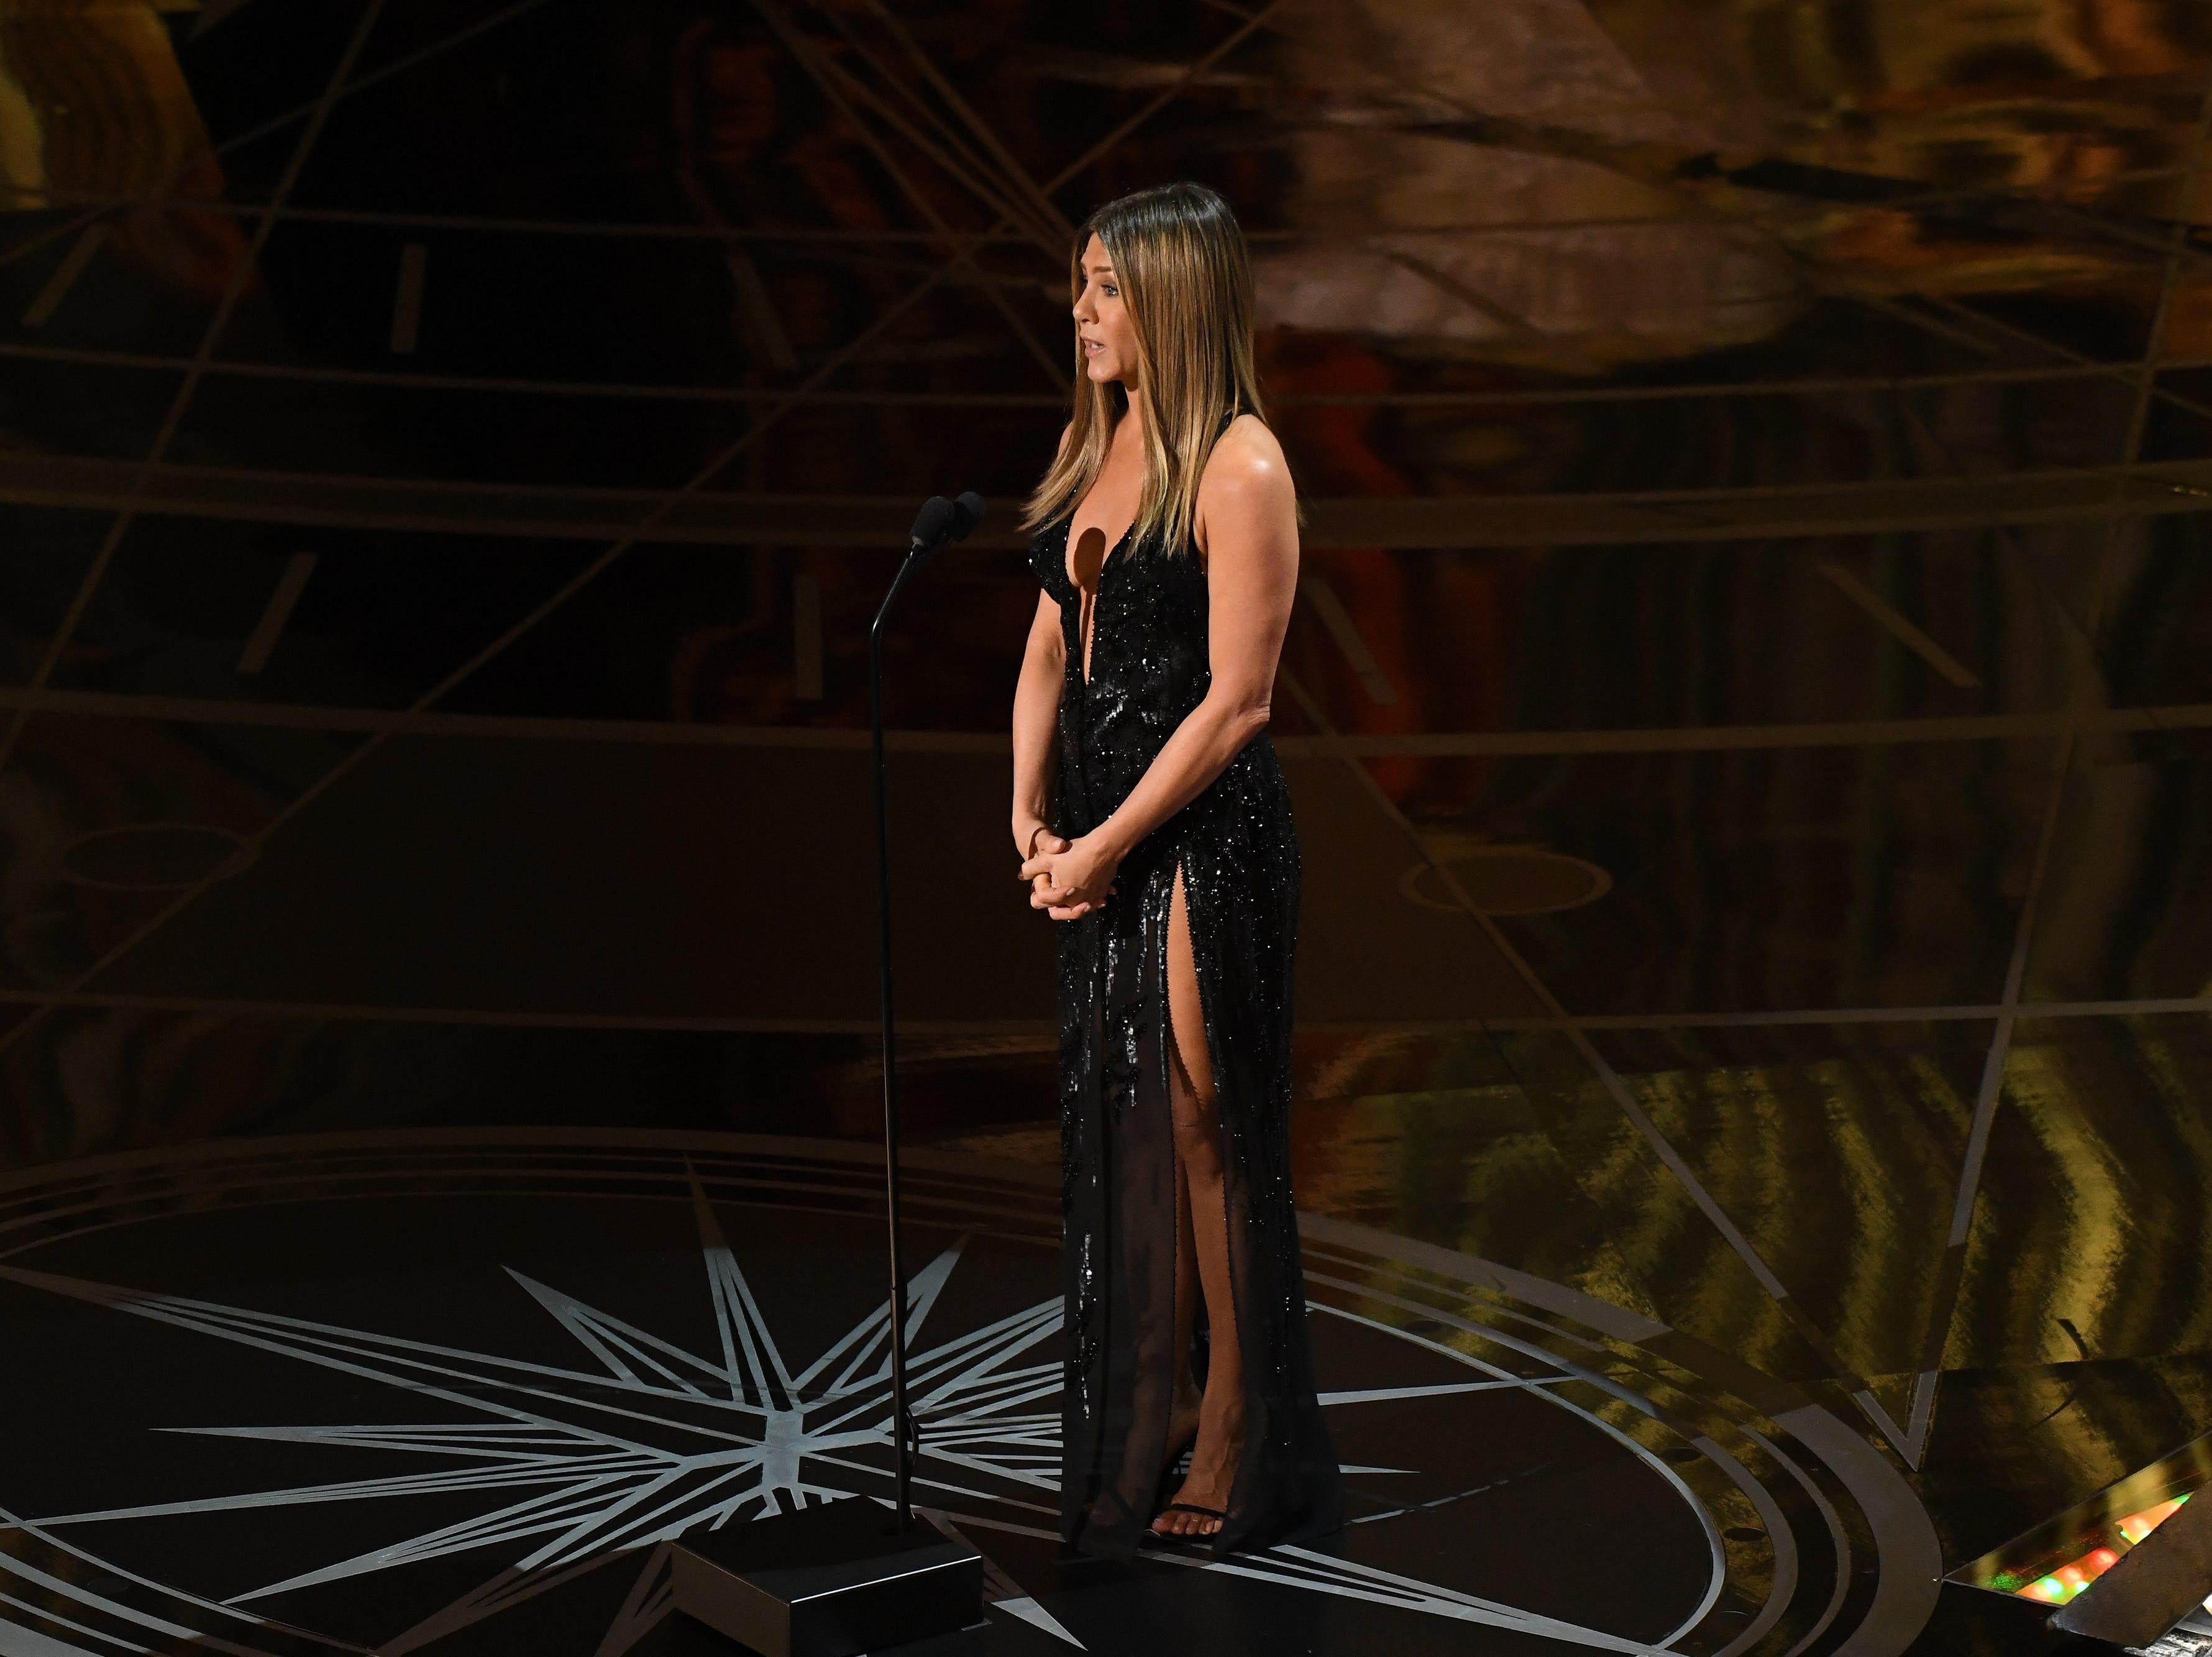 Aniston presents the In Memorium segment at the 2017 Academy Awards.